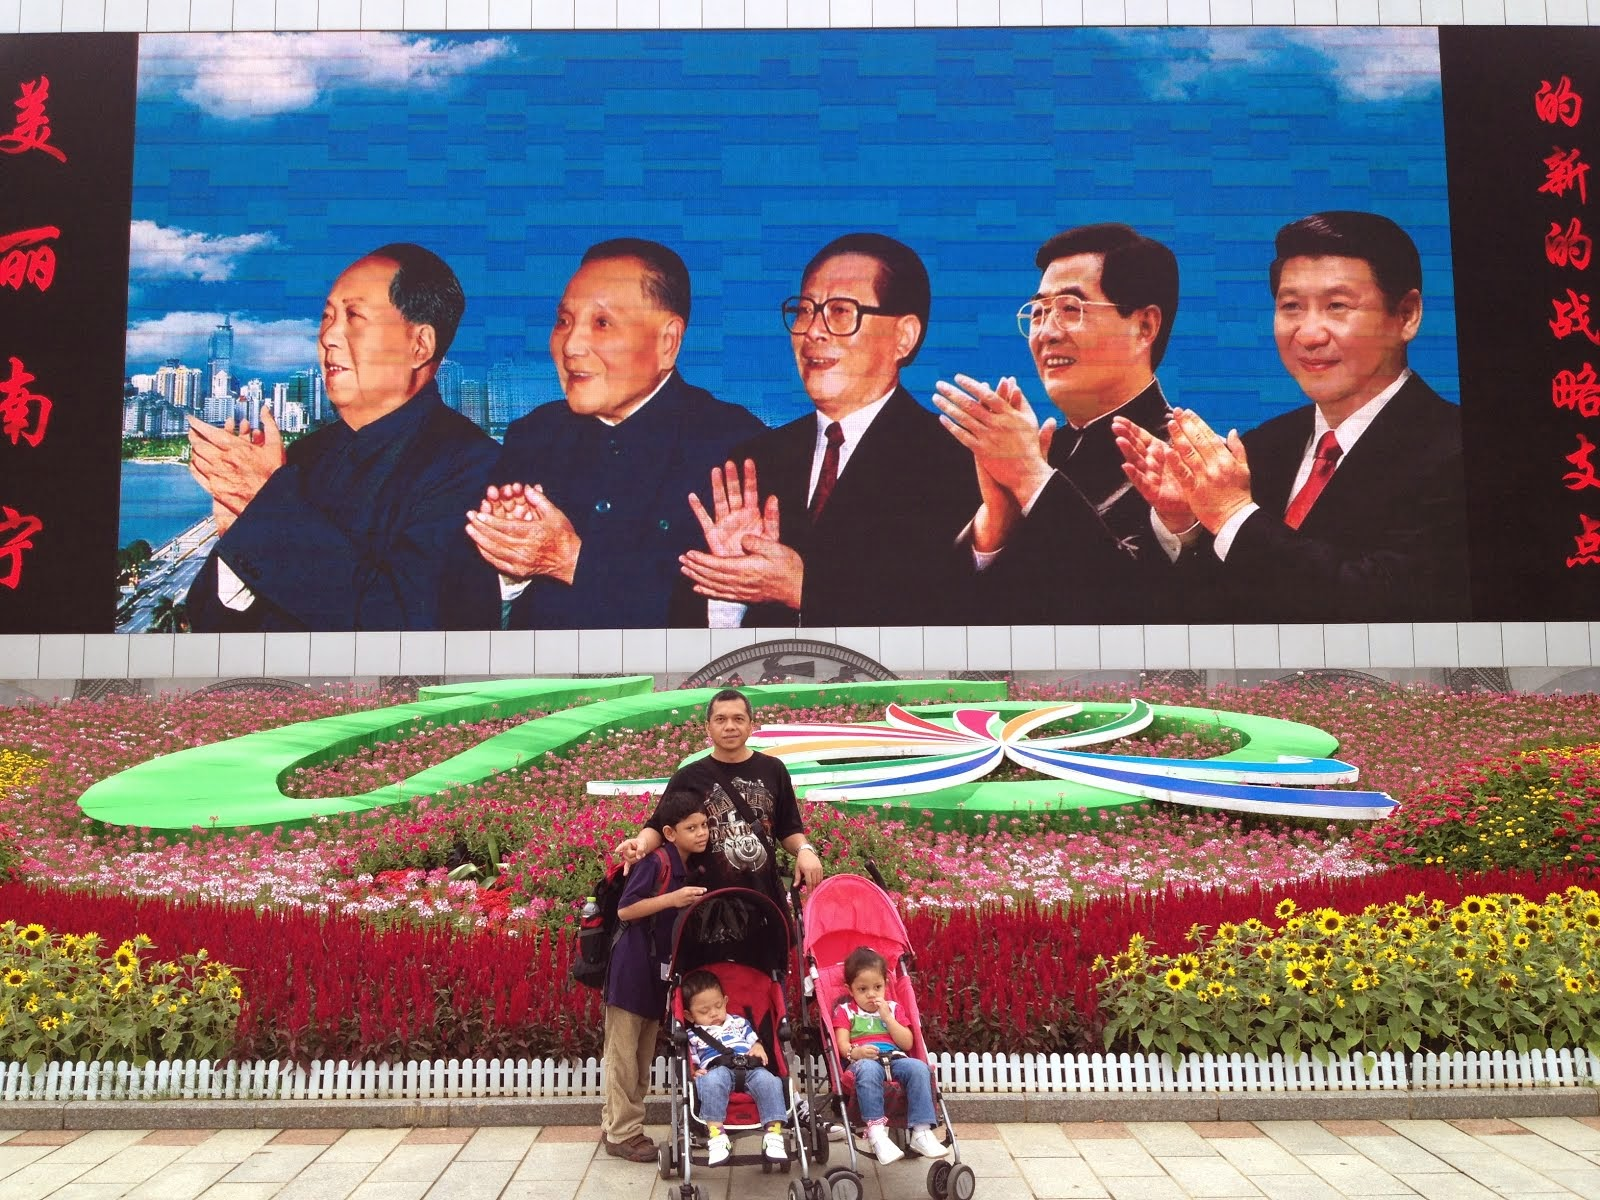 Nanning, China 2013